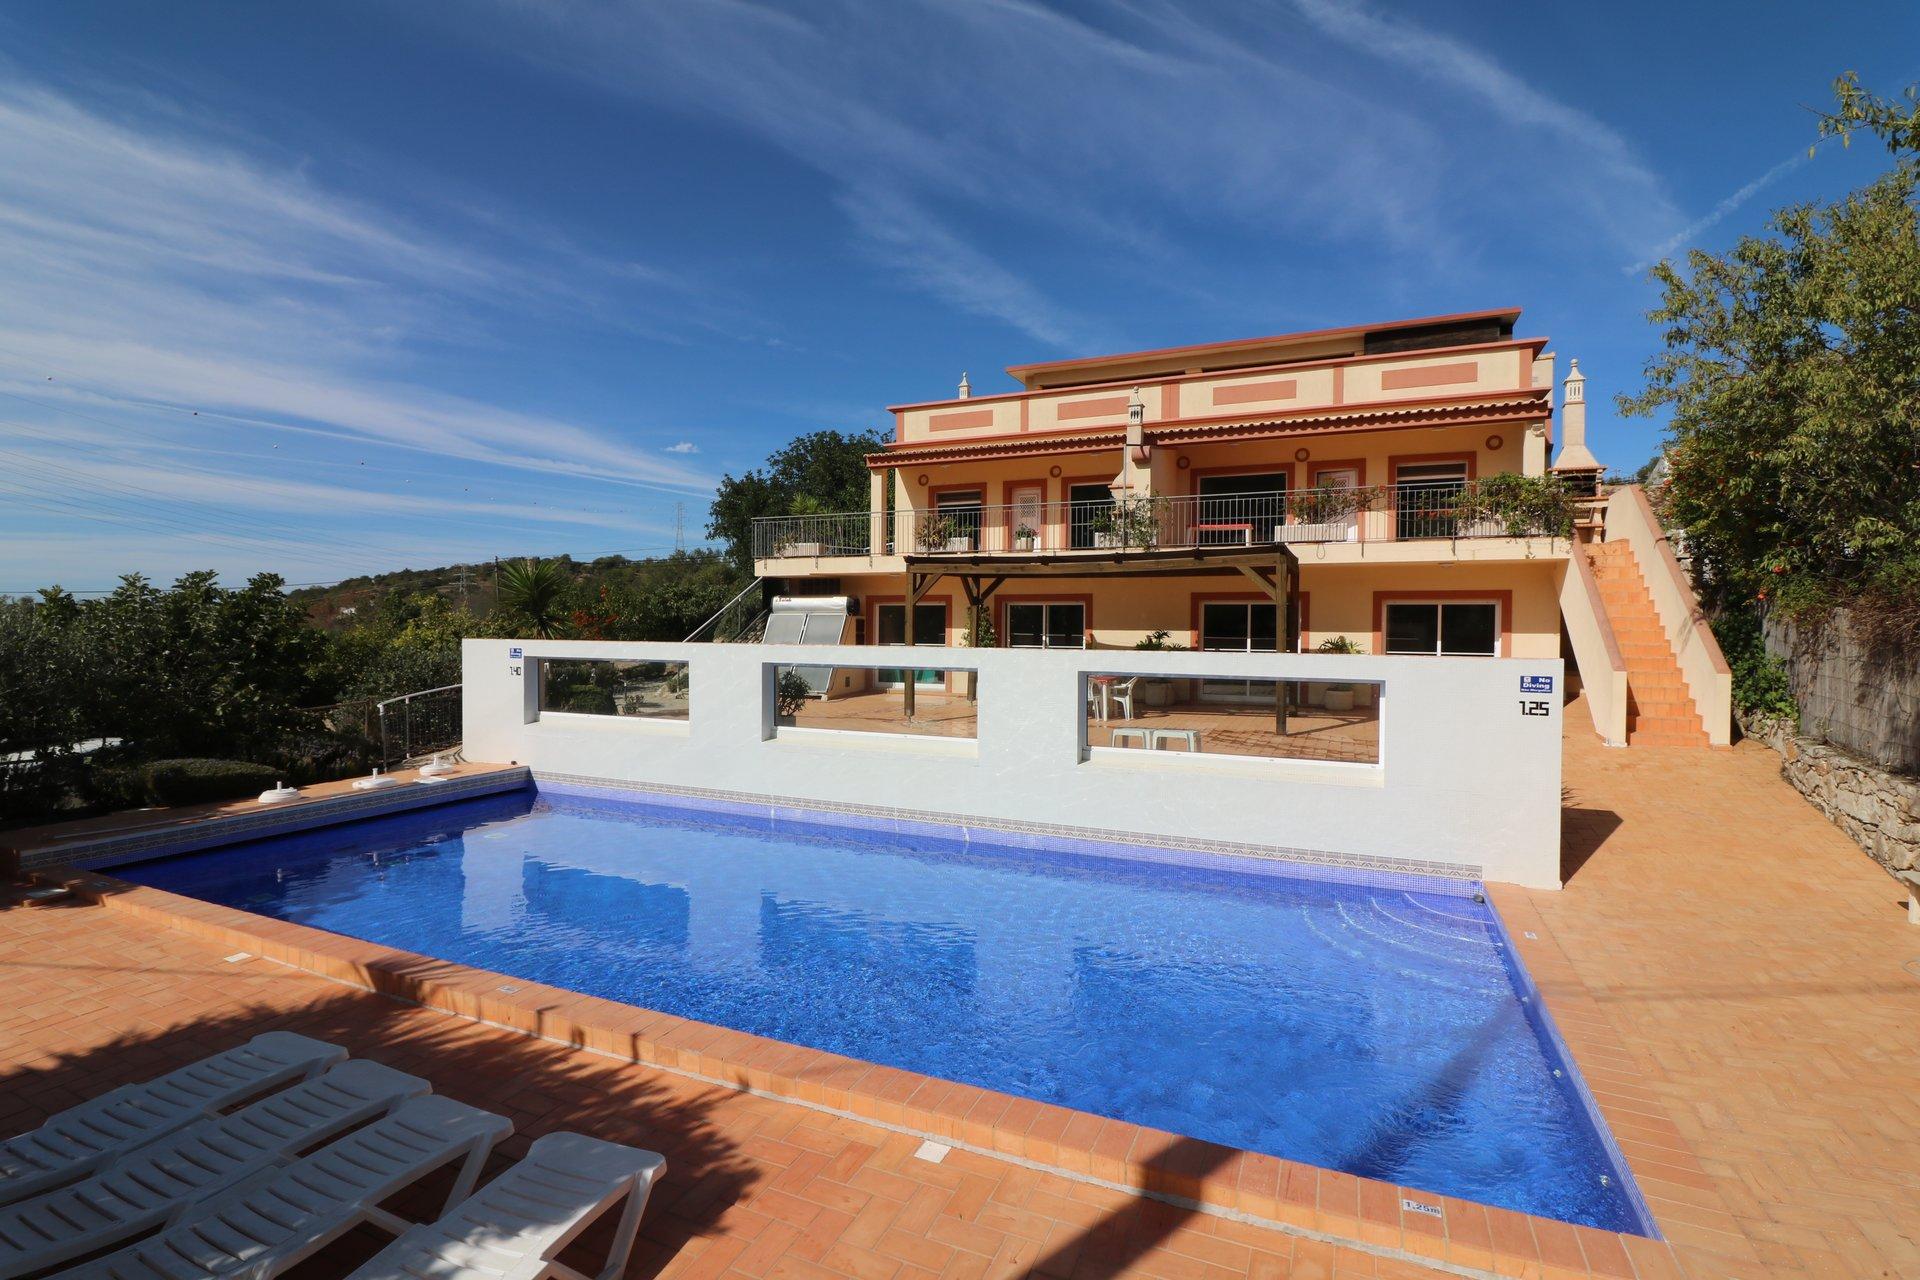 6 Bedroom Villa Estoi, Central Algarve Ref: JV10386